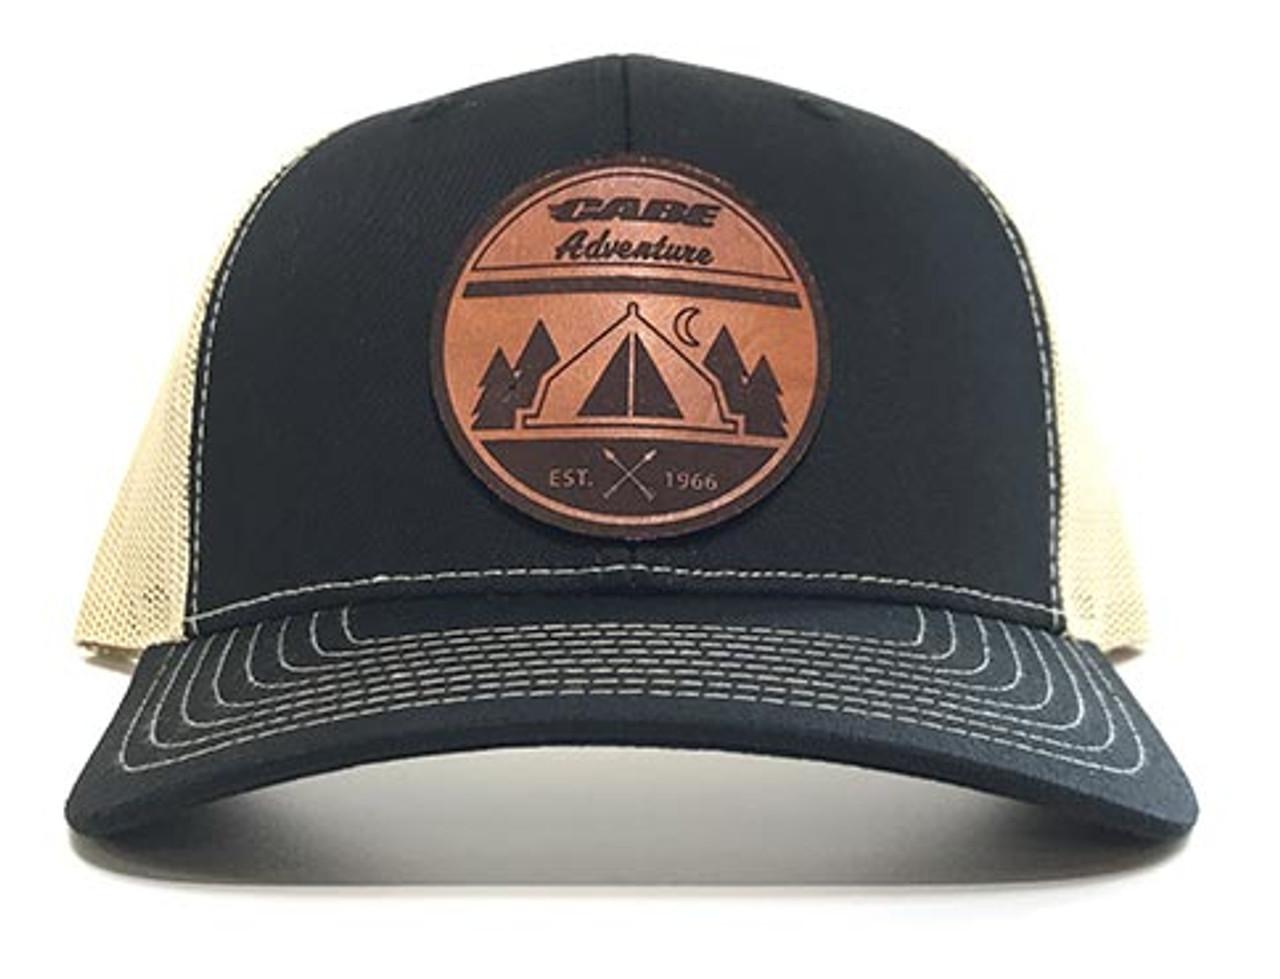 Black / Tan color - Cabe Adventure Leather Patch Hats